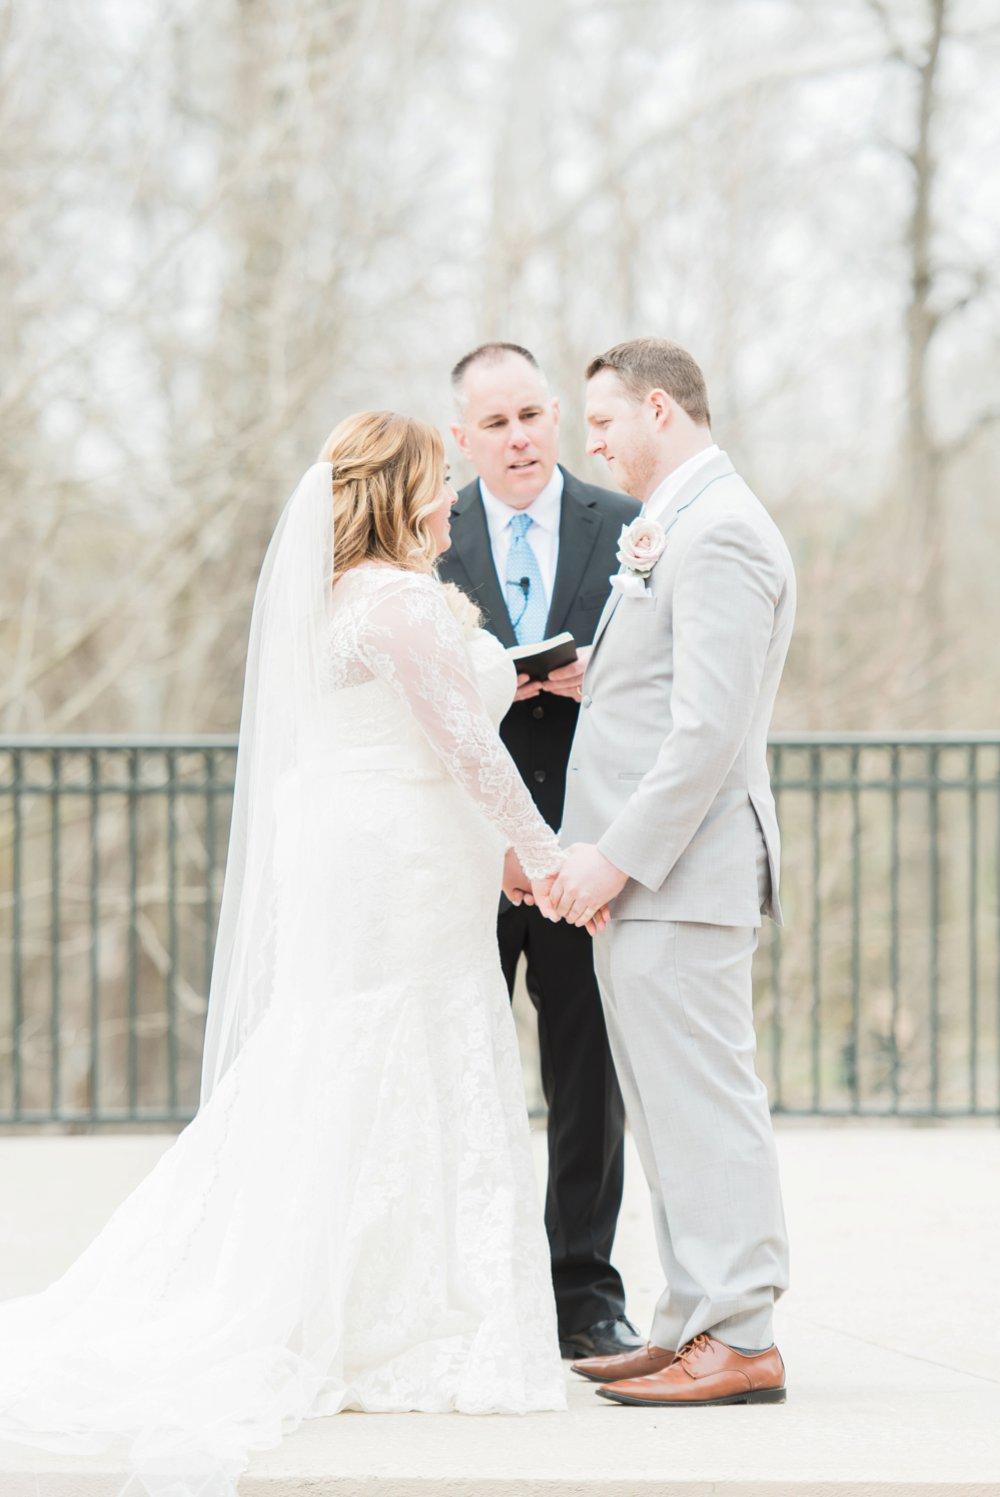 creekside-gahanna-ohio-wedding-melissa-matt_0075.jpg